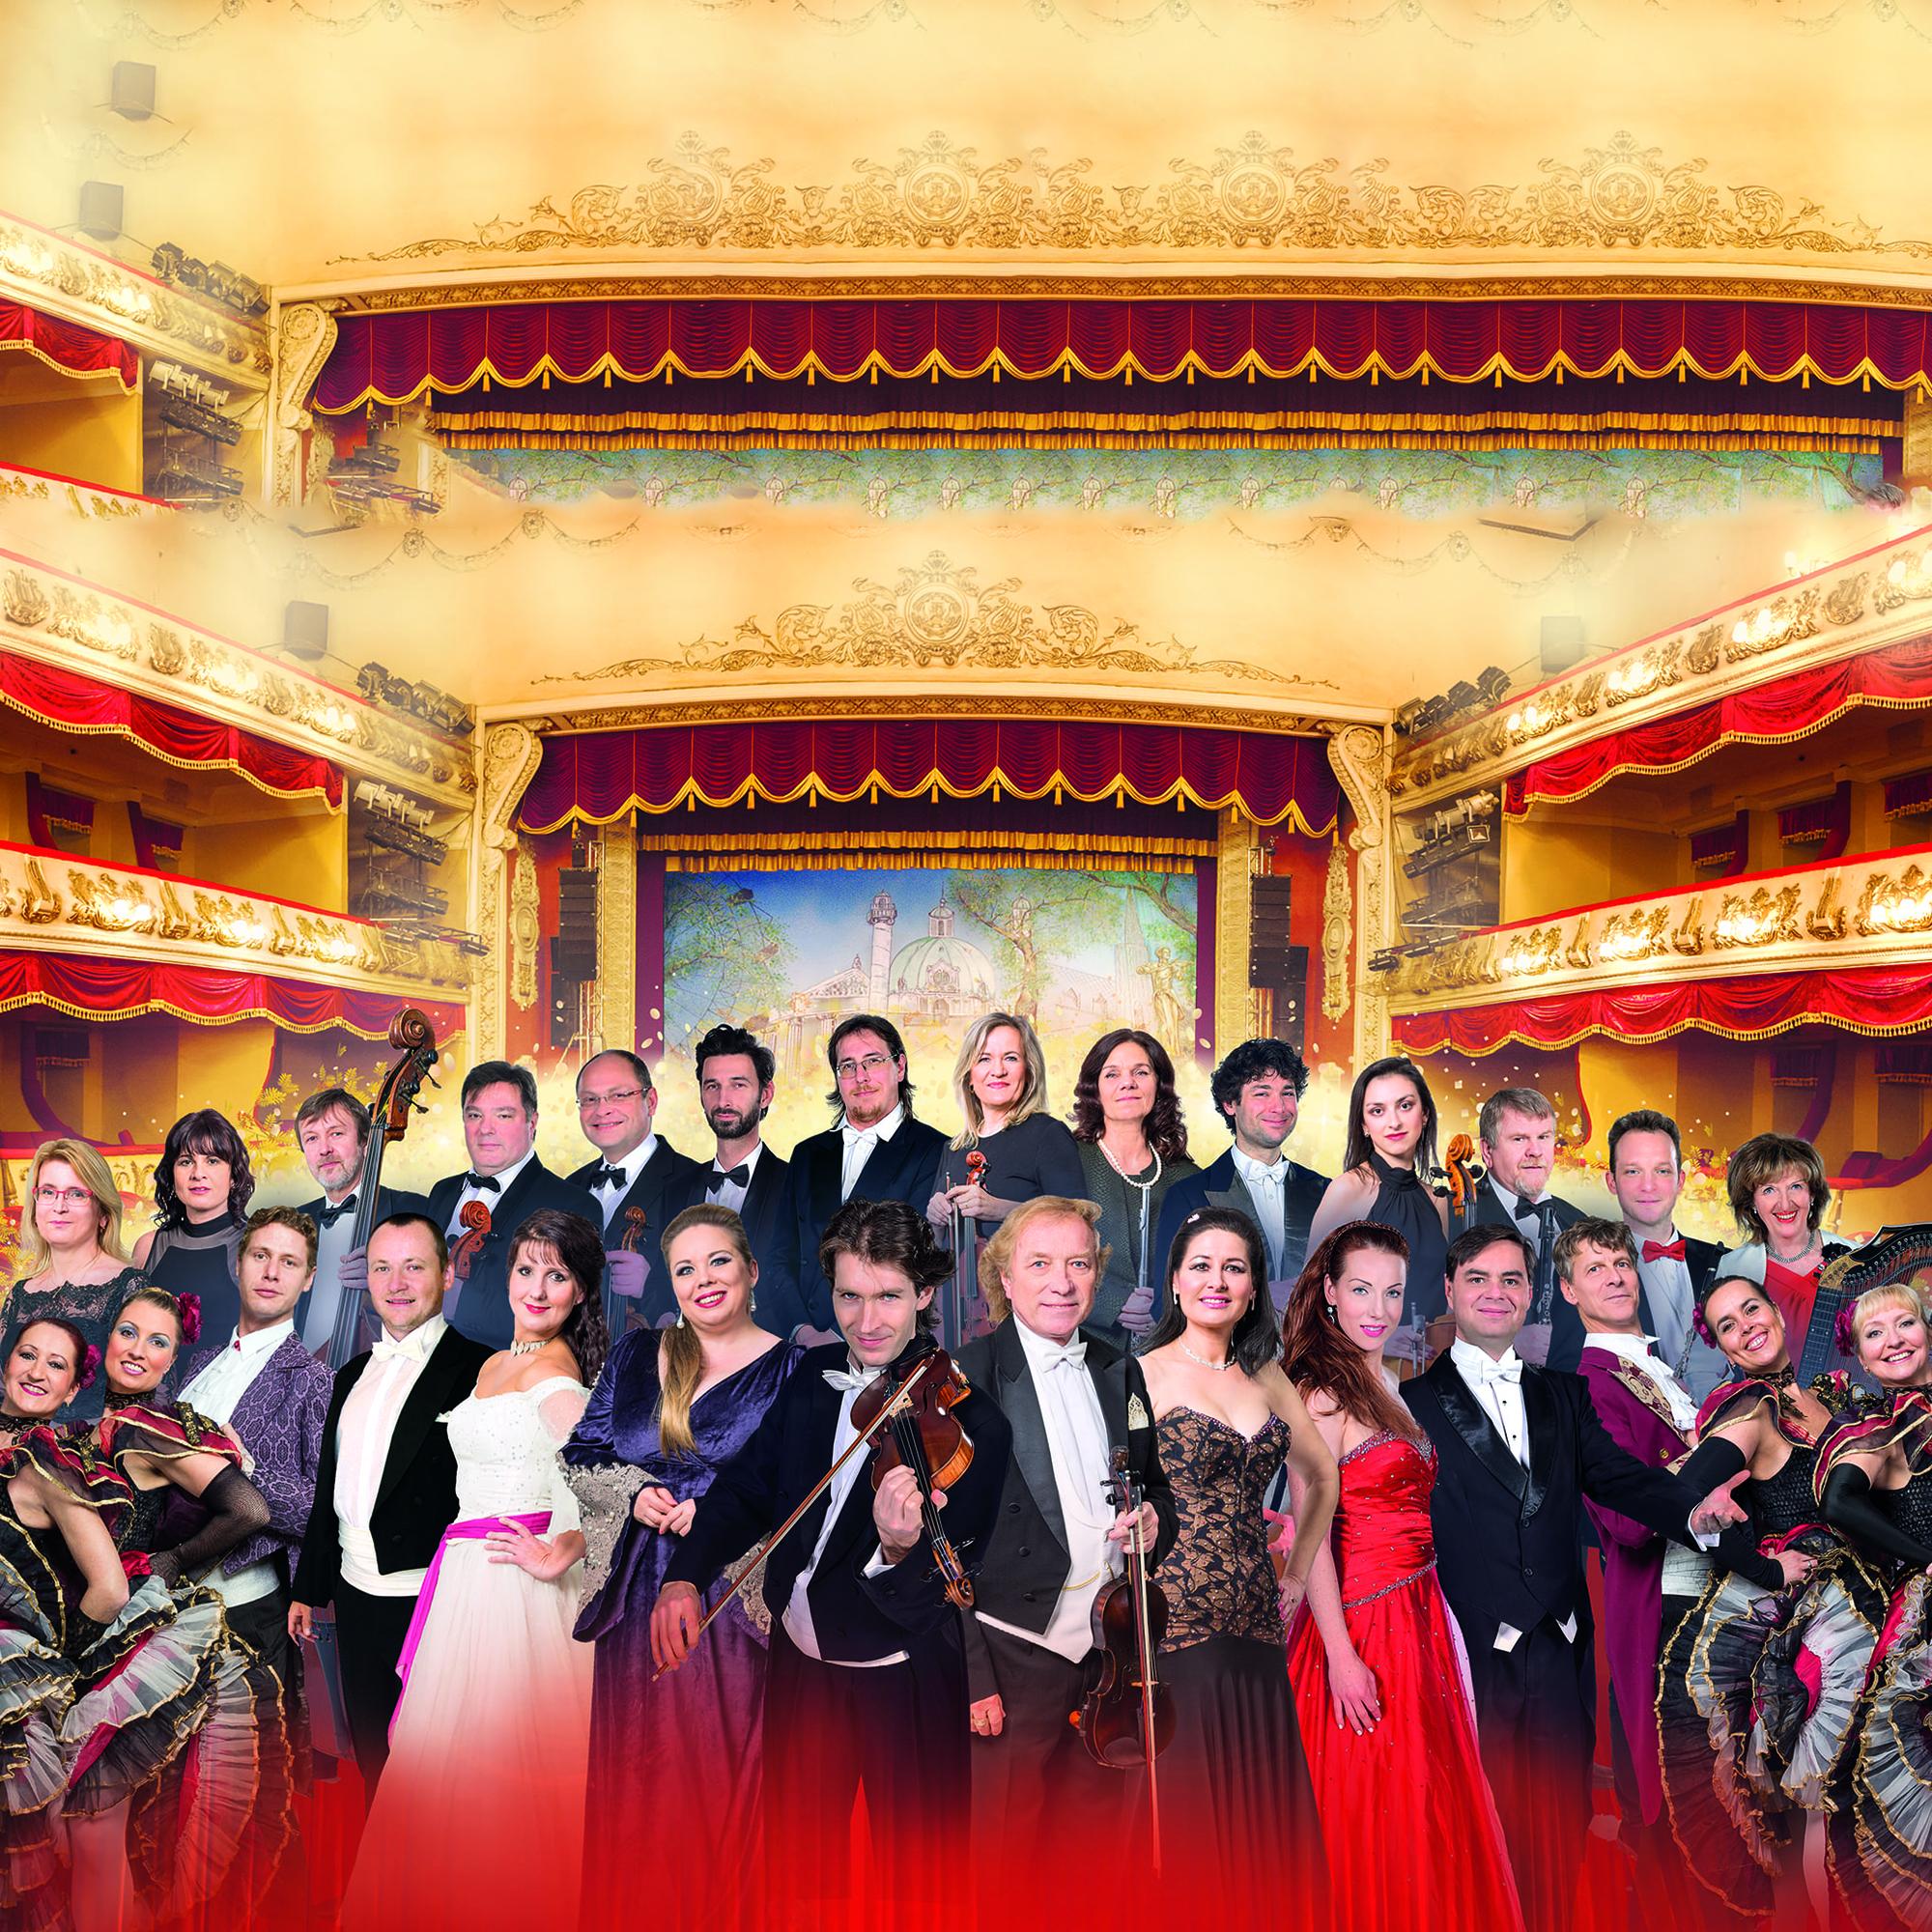 zauber der operette | oper und operette | kultur